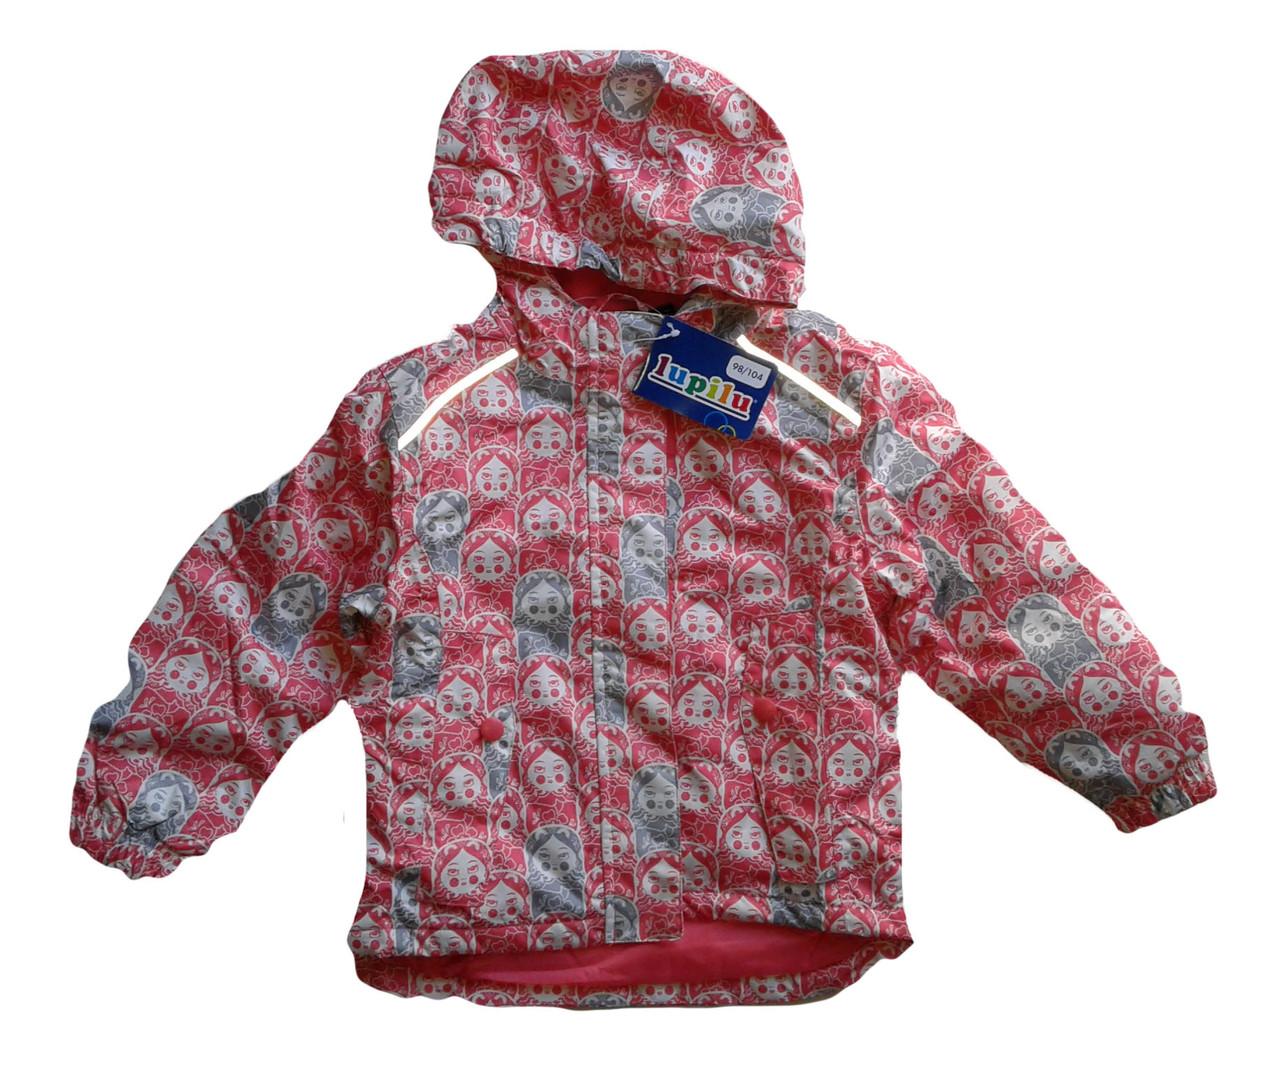 Куртка  для девочки, Lupilu, размер  98/104, арт. Л-415